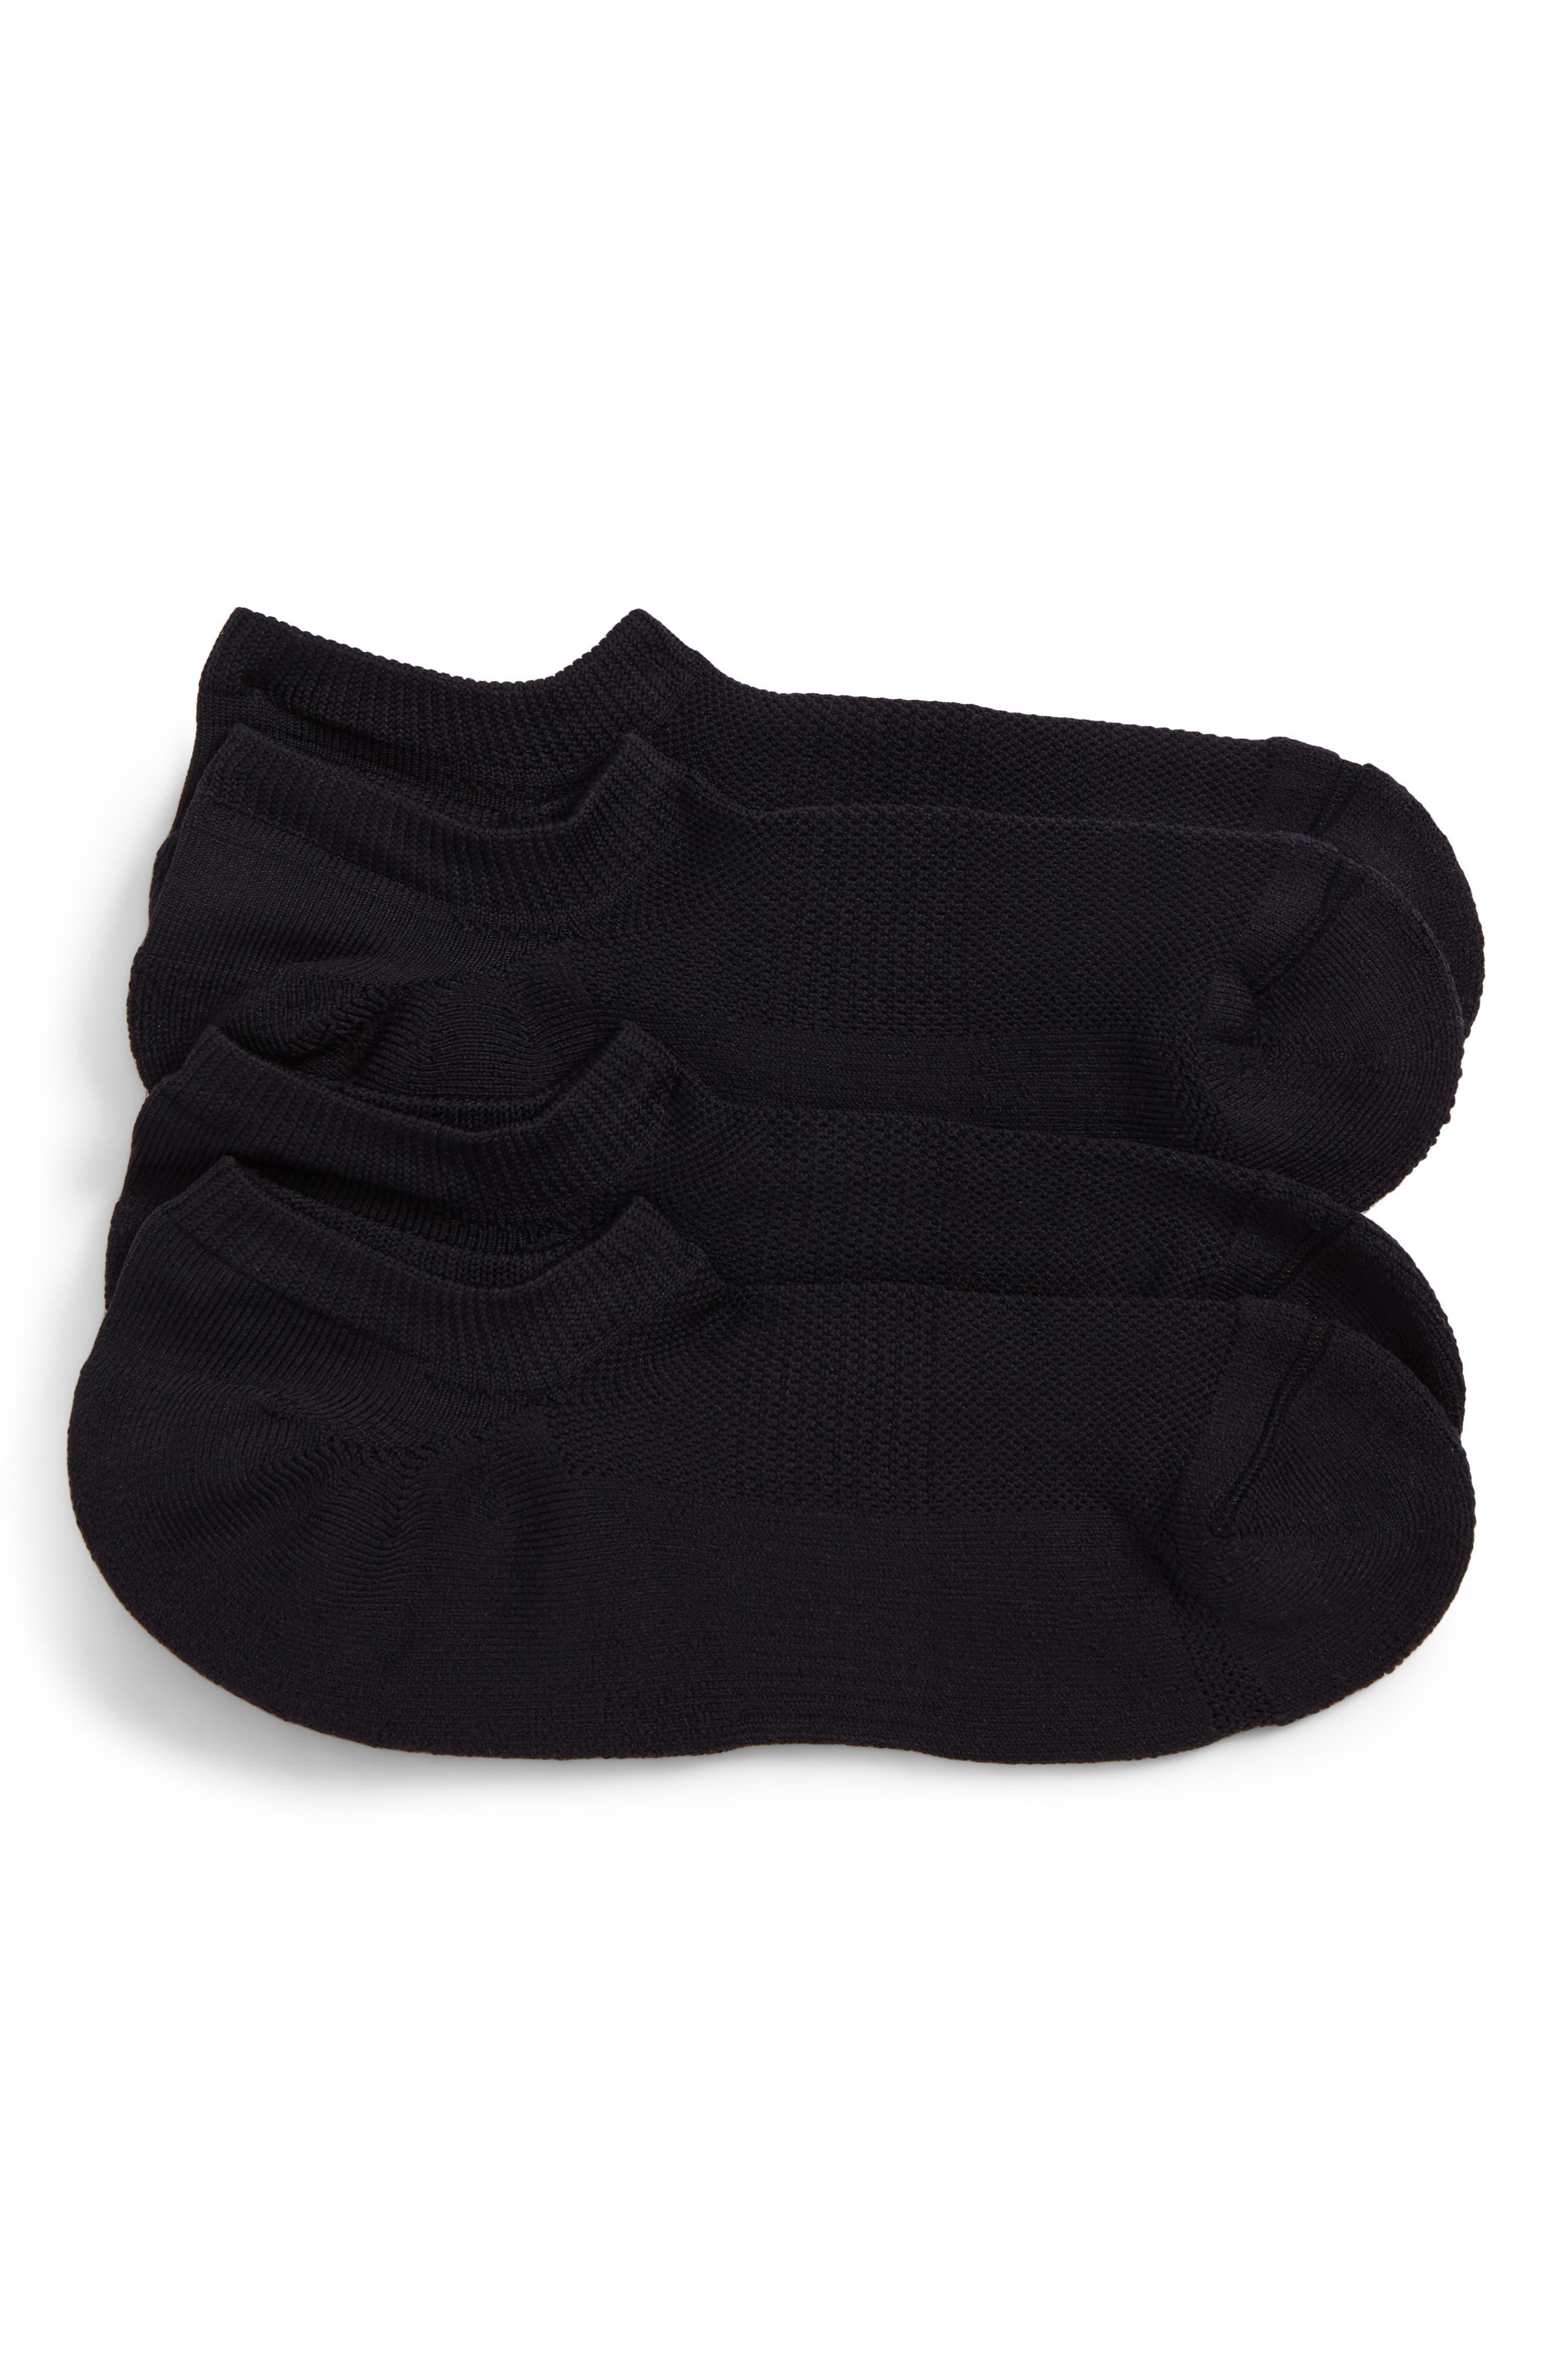 Tech-Smart 2-Pack No-Show Socks,                             Main thumbnail 1, color,                             Black